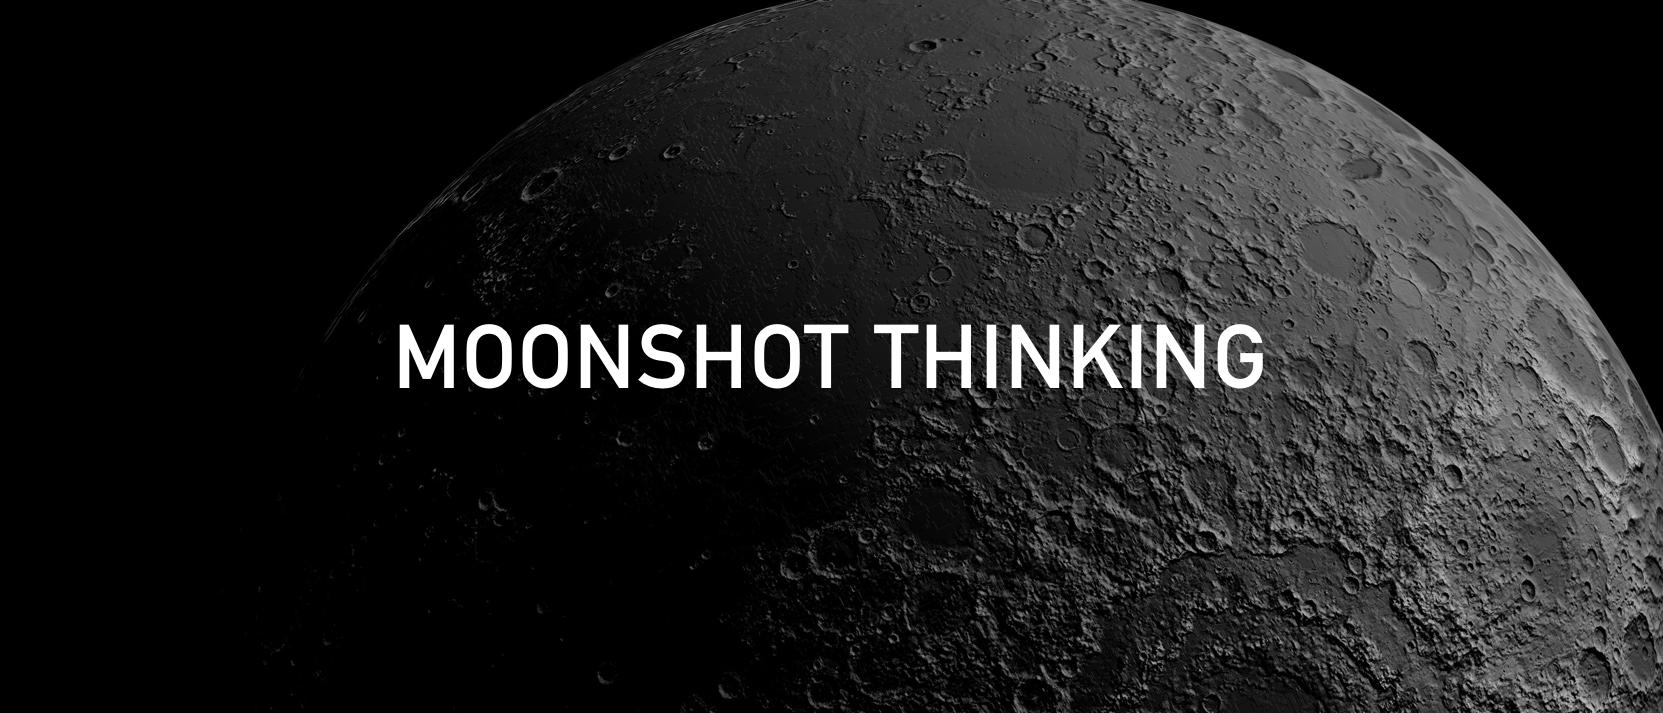 Moonshot Thinking. As the world is celebrating 50 years of…   by Siddarth  Kengadaran   Siddarth Kengadaran